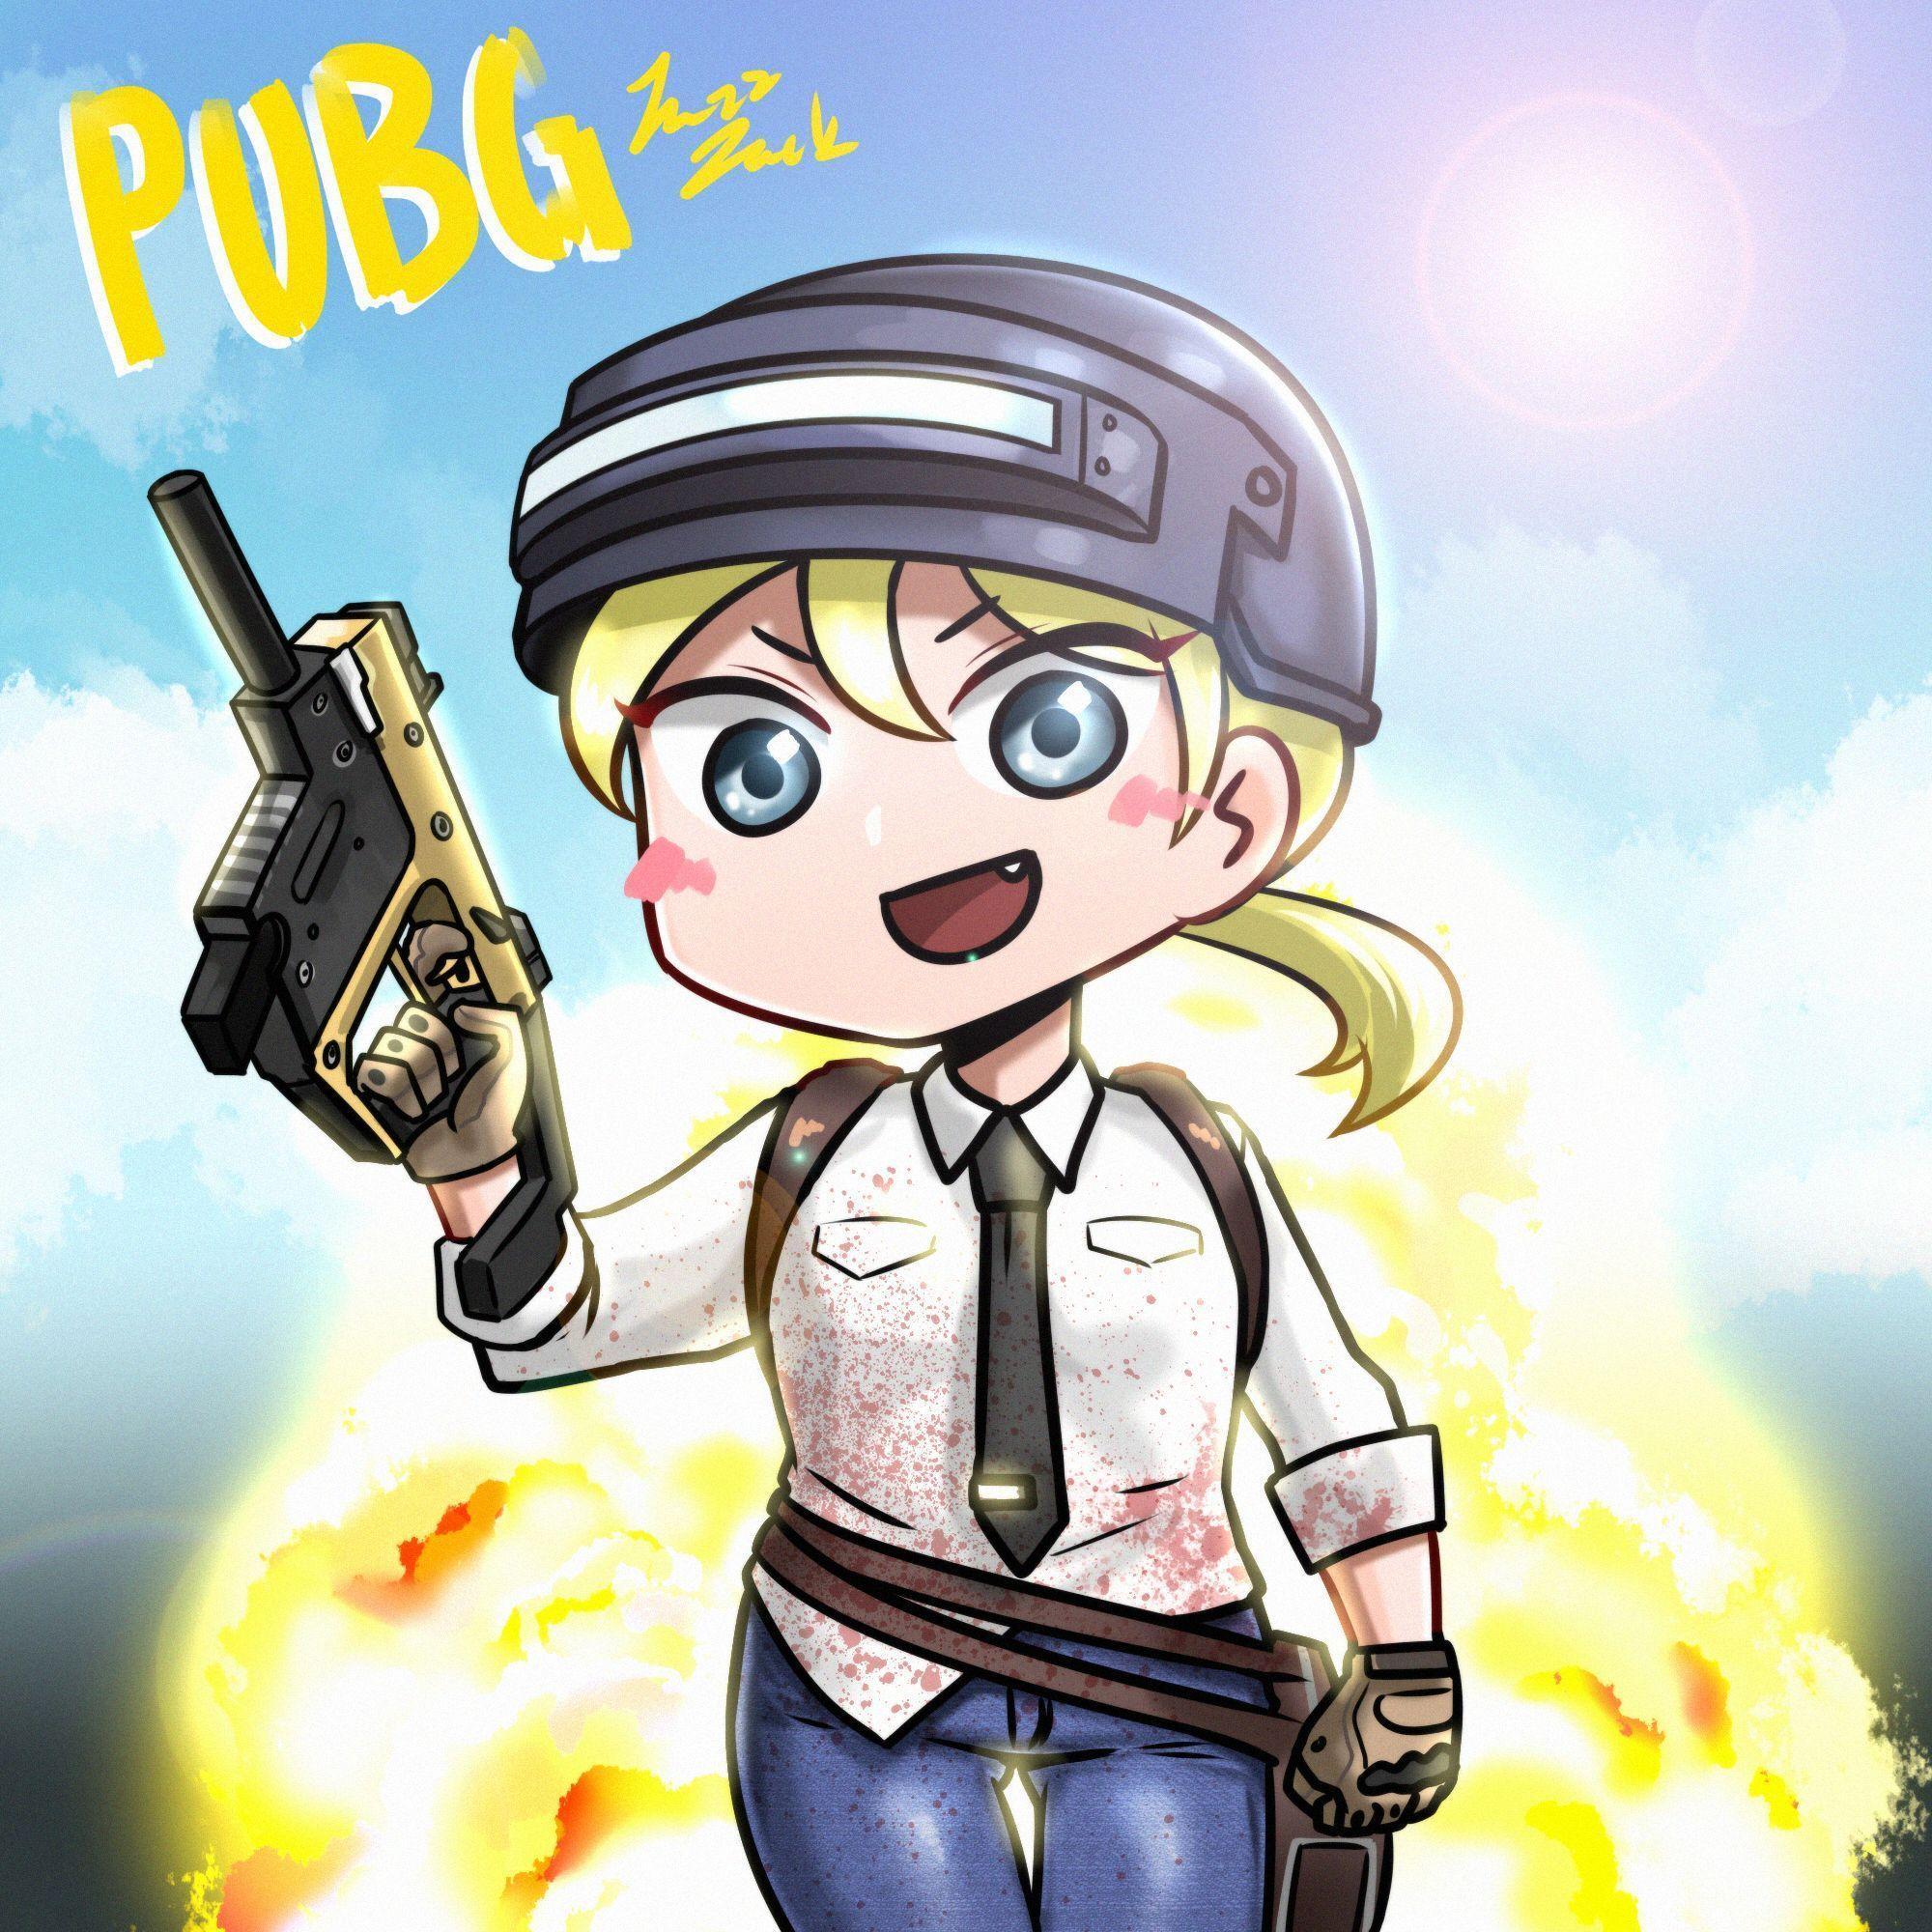 PUBG Cartoon Wallpapers - Top Free PUBG Cartoon ...